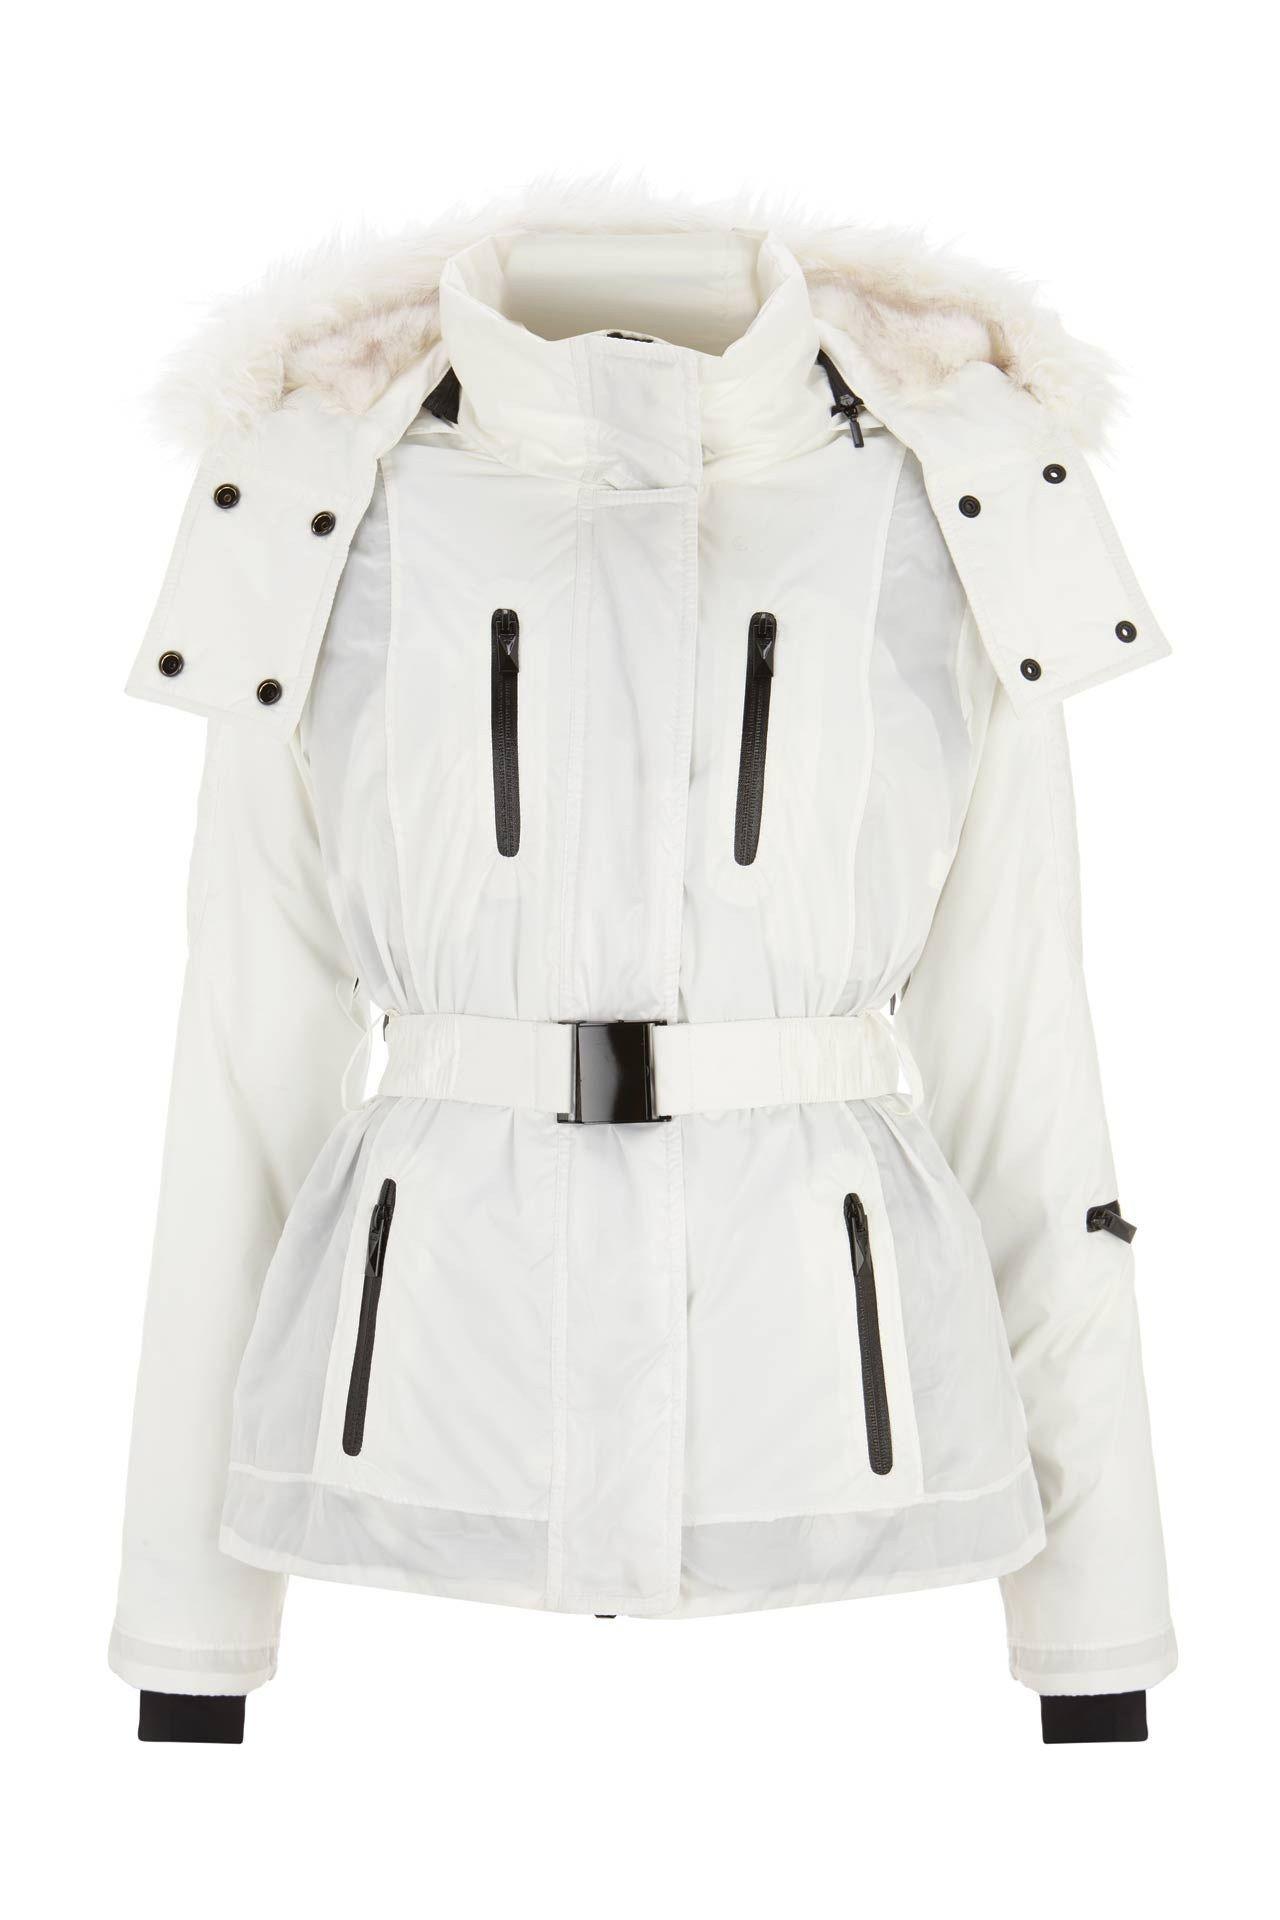 cdbe34c588 Ski Fashion – Best Womens Ski Wear   Accessories (Vogue.com UK)